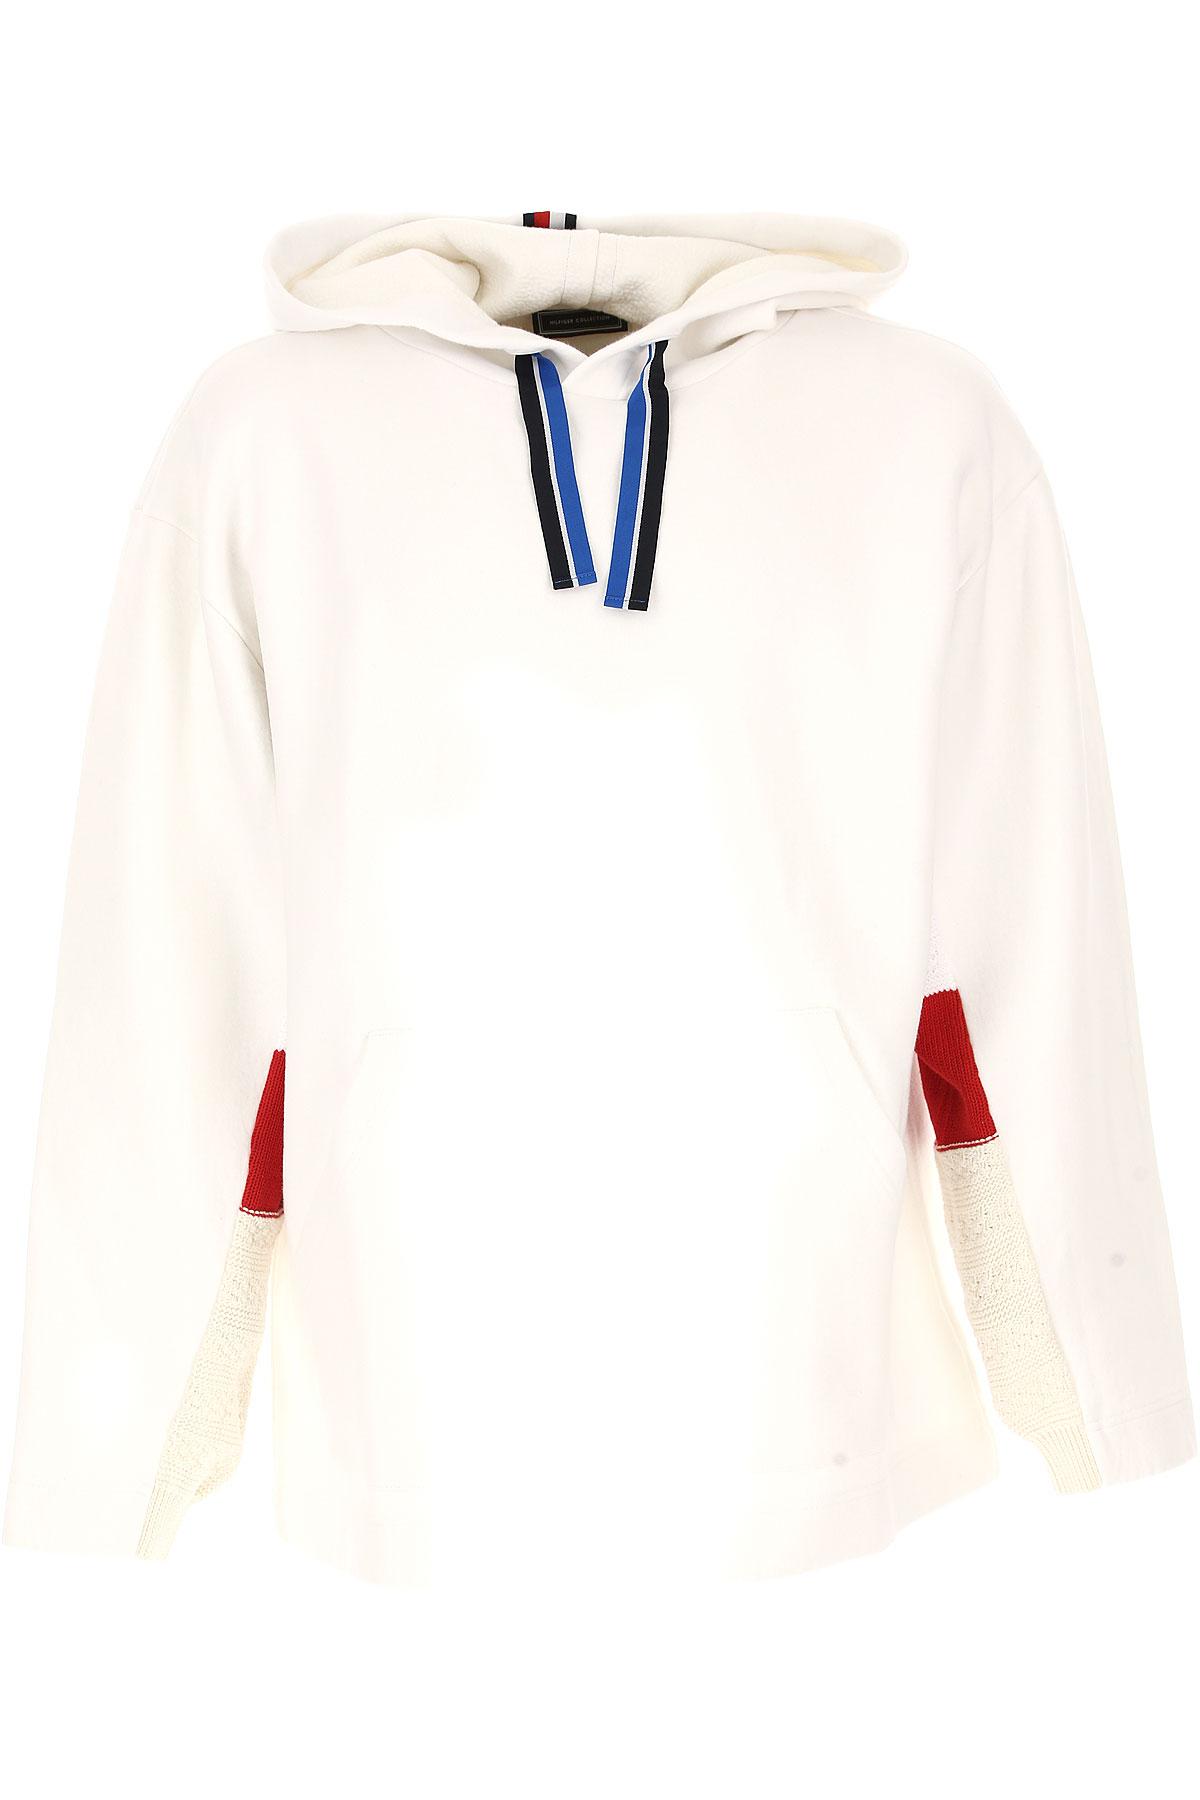 Tommy Hilfiger Sweatshirt for Men On Sale, White, Cotton, 2017, L M S USA-441946